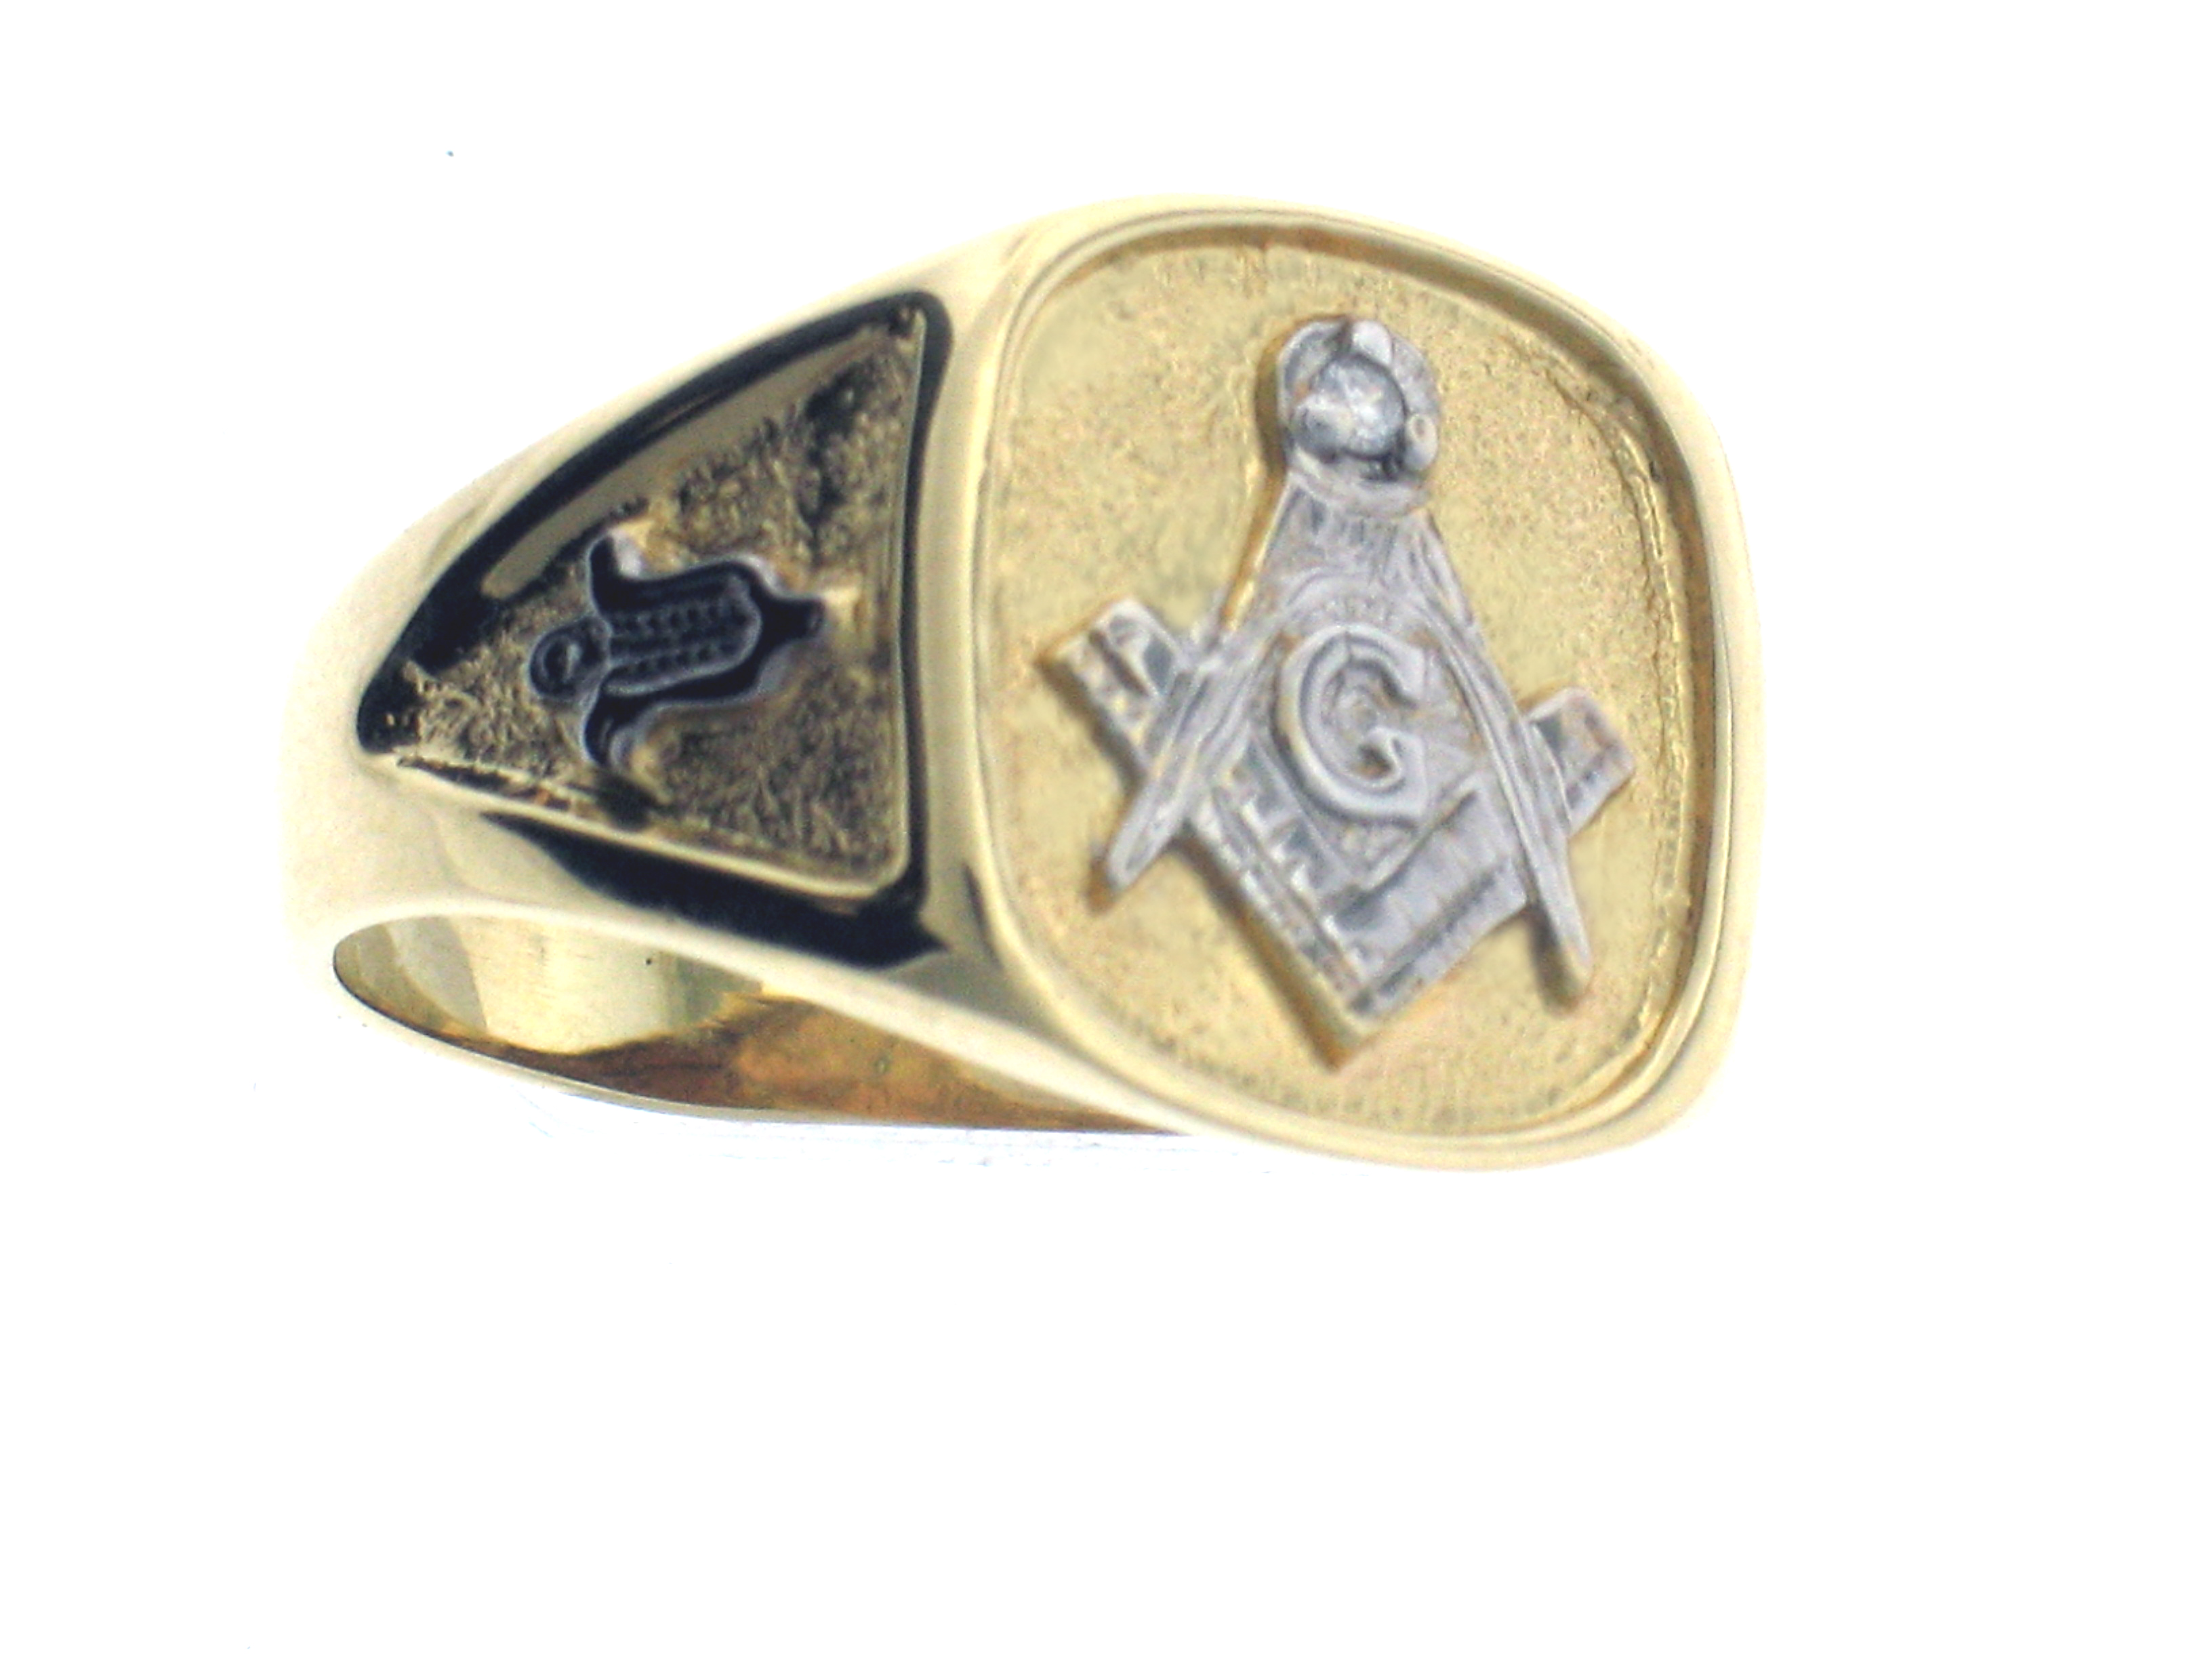 10karat white or yellow gold open back masonic ring click